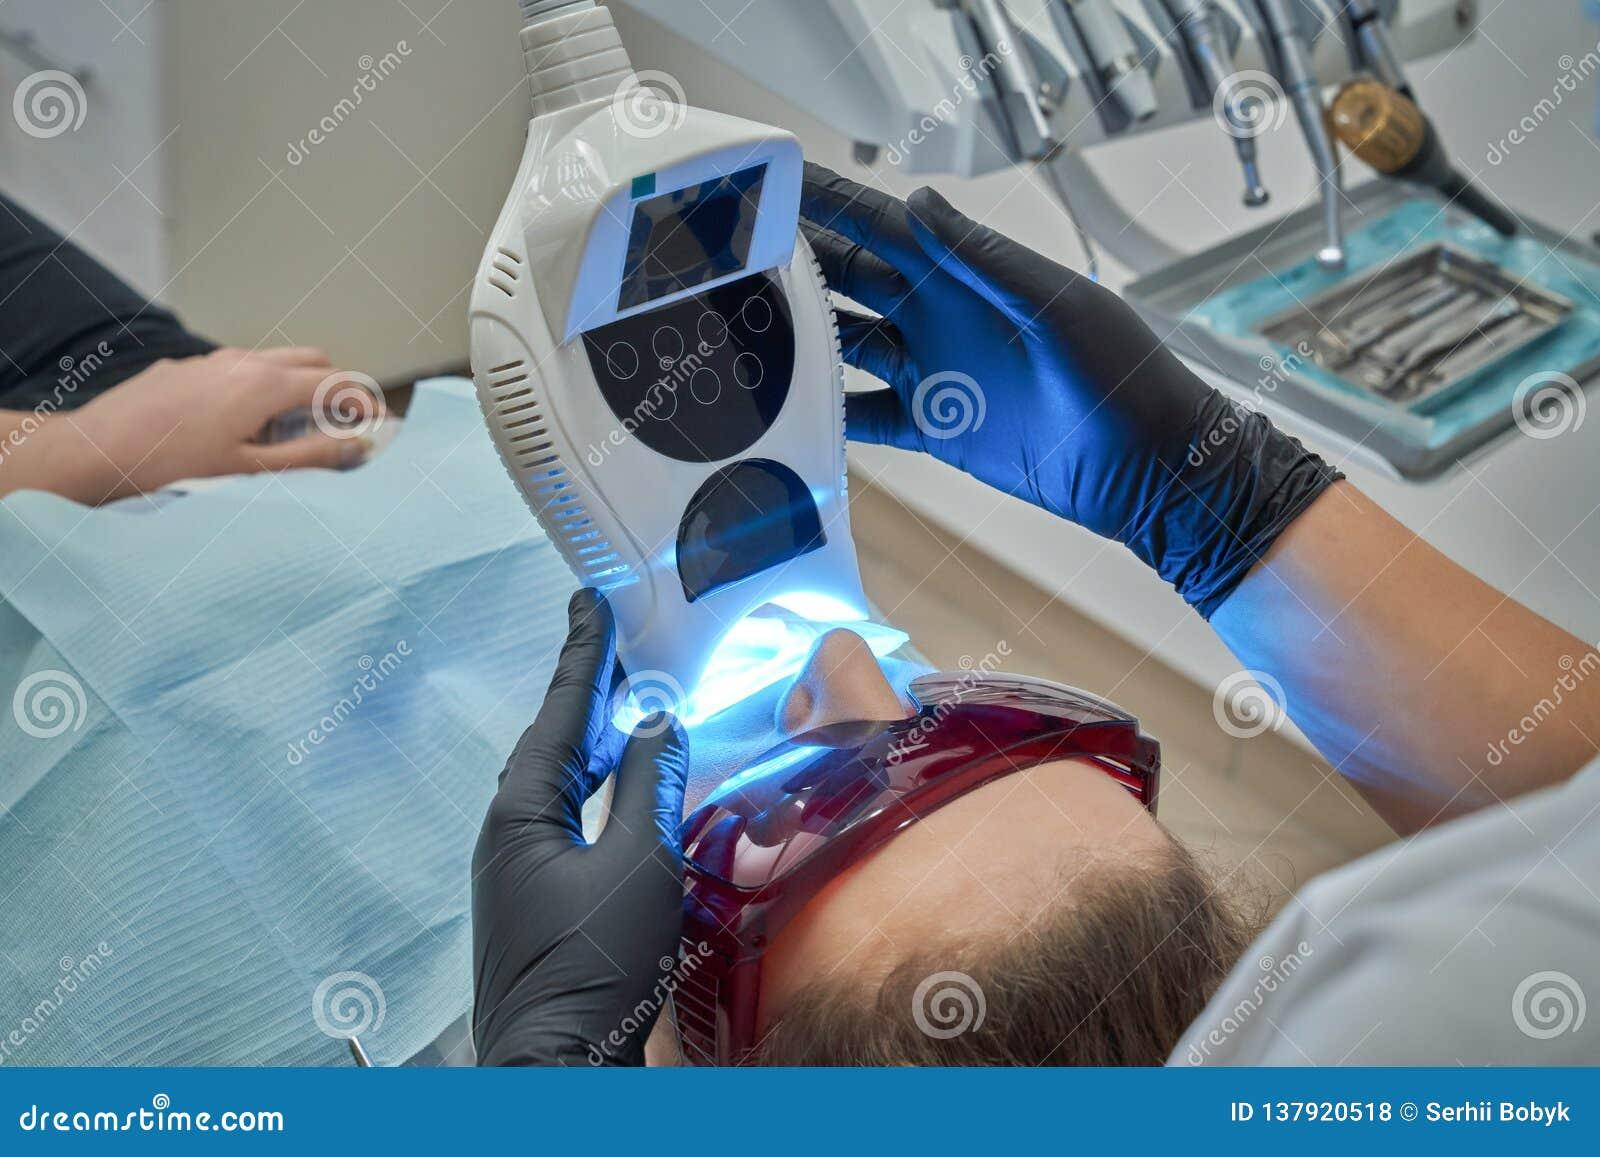 Teeth Whitening Procedure With Uv Light Stock Photo Image Of